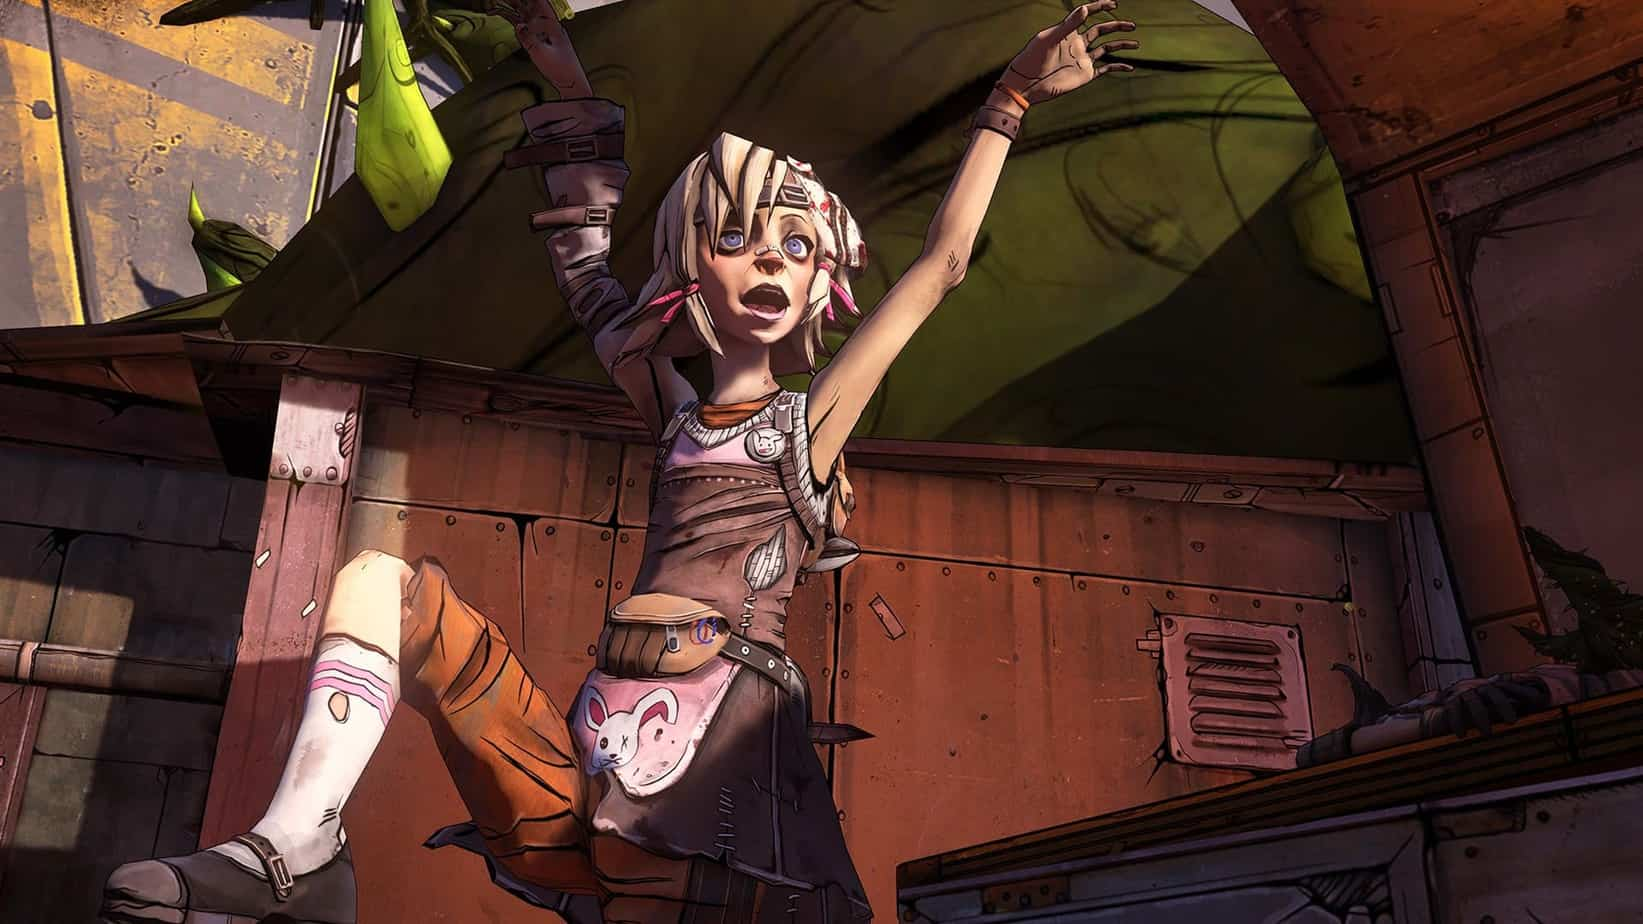 Borderlands 2 Commander Lilith & The Fight For Sanctuary закрученная история